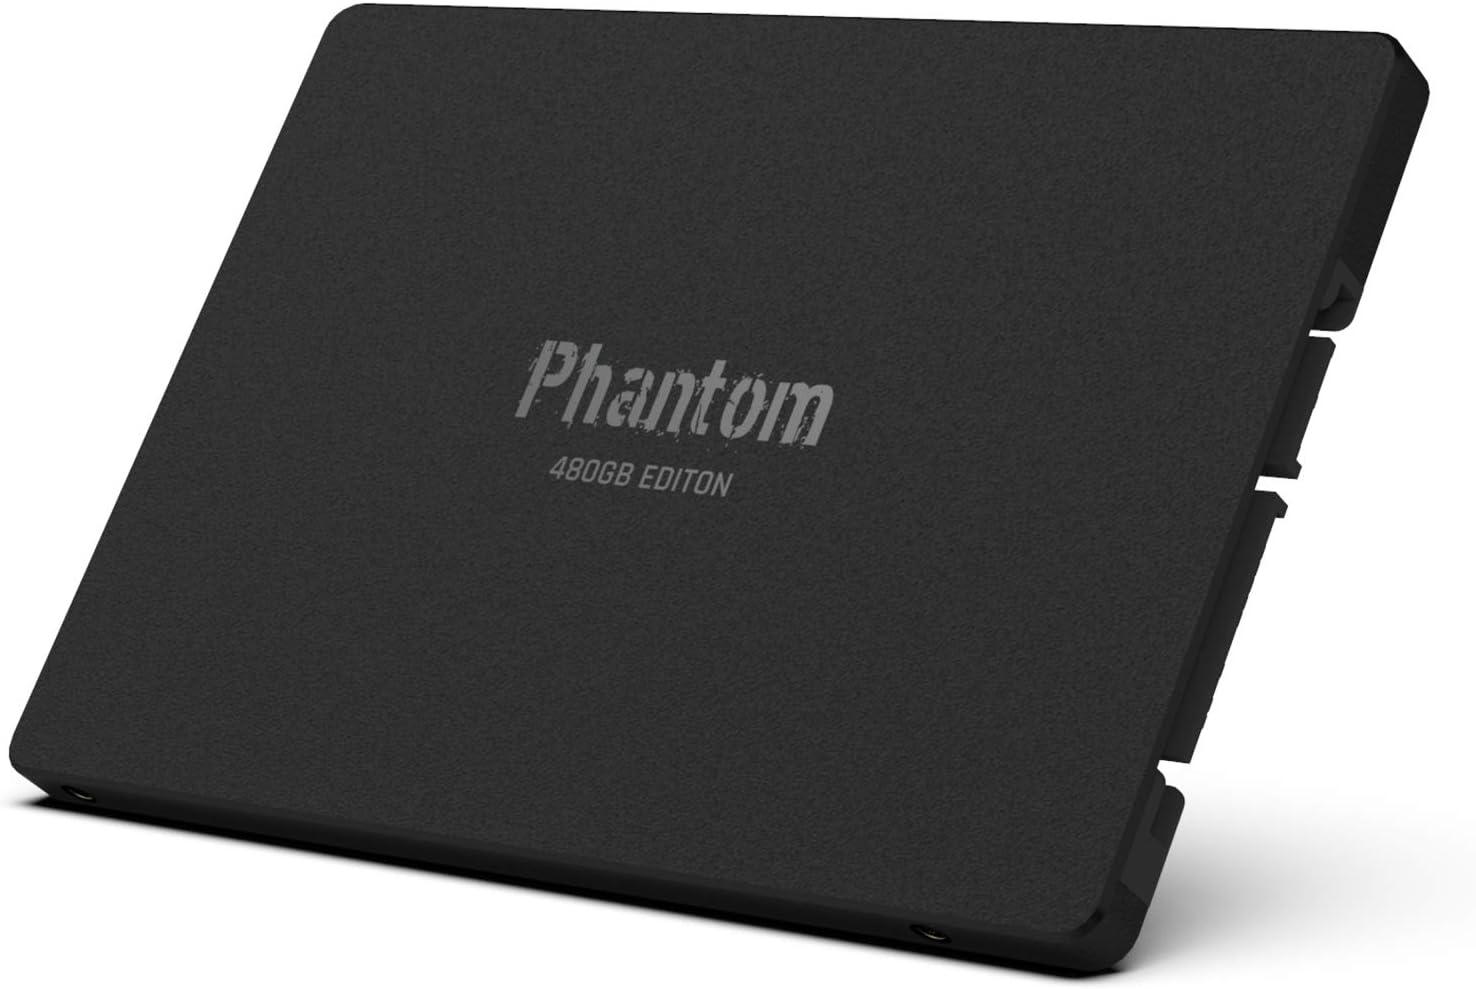 Verico Phantom Interne Ssd Sata Iii 2 5 Zoll 240gb 3d Computer Zubehör